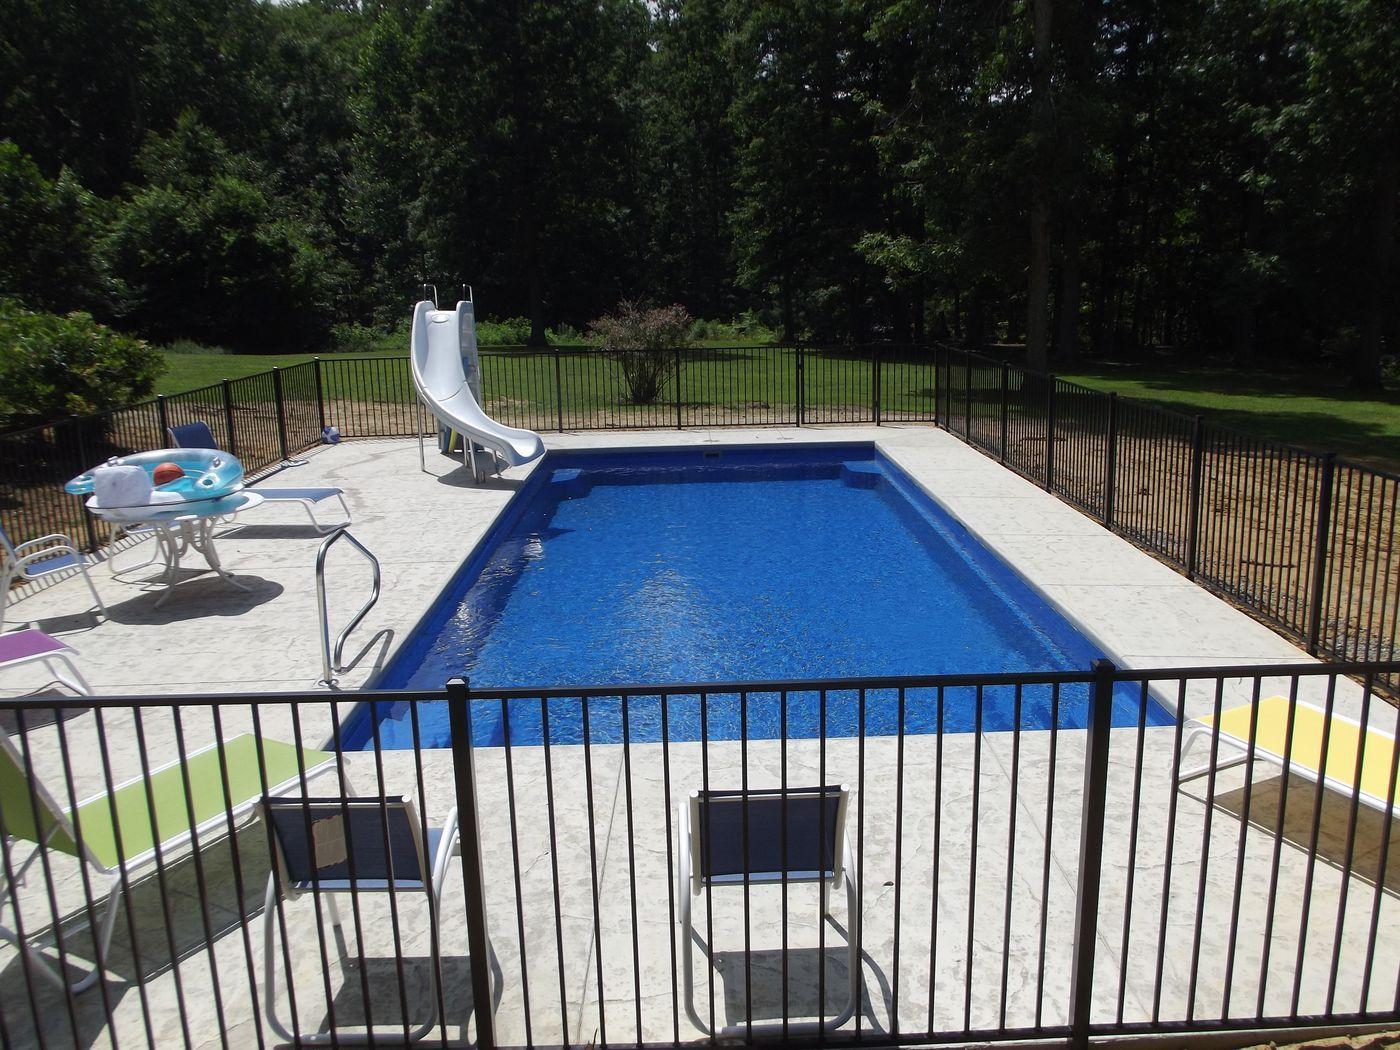 16 X 36 Fiberglass pool 3 1/2' to 5 1/2' Deep